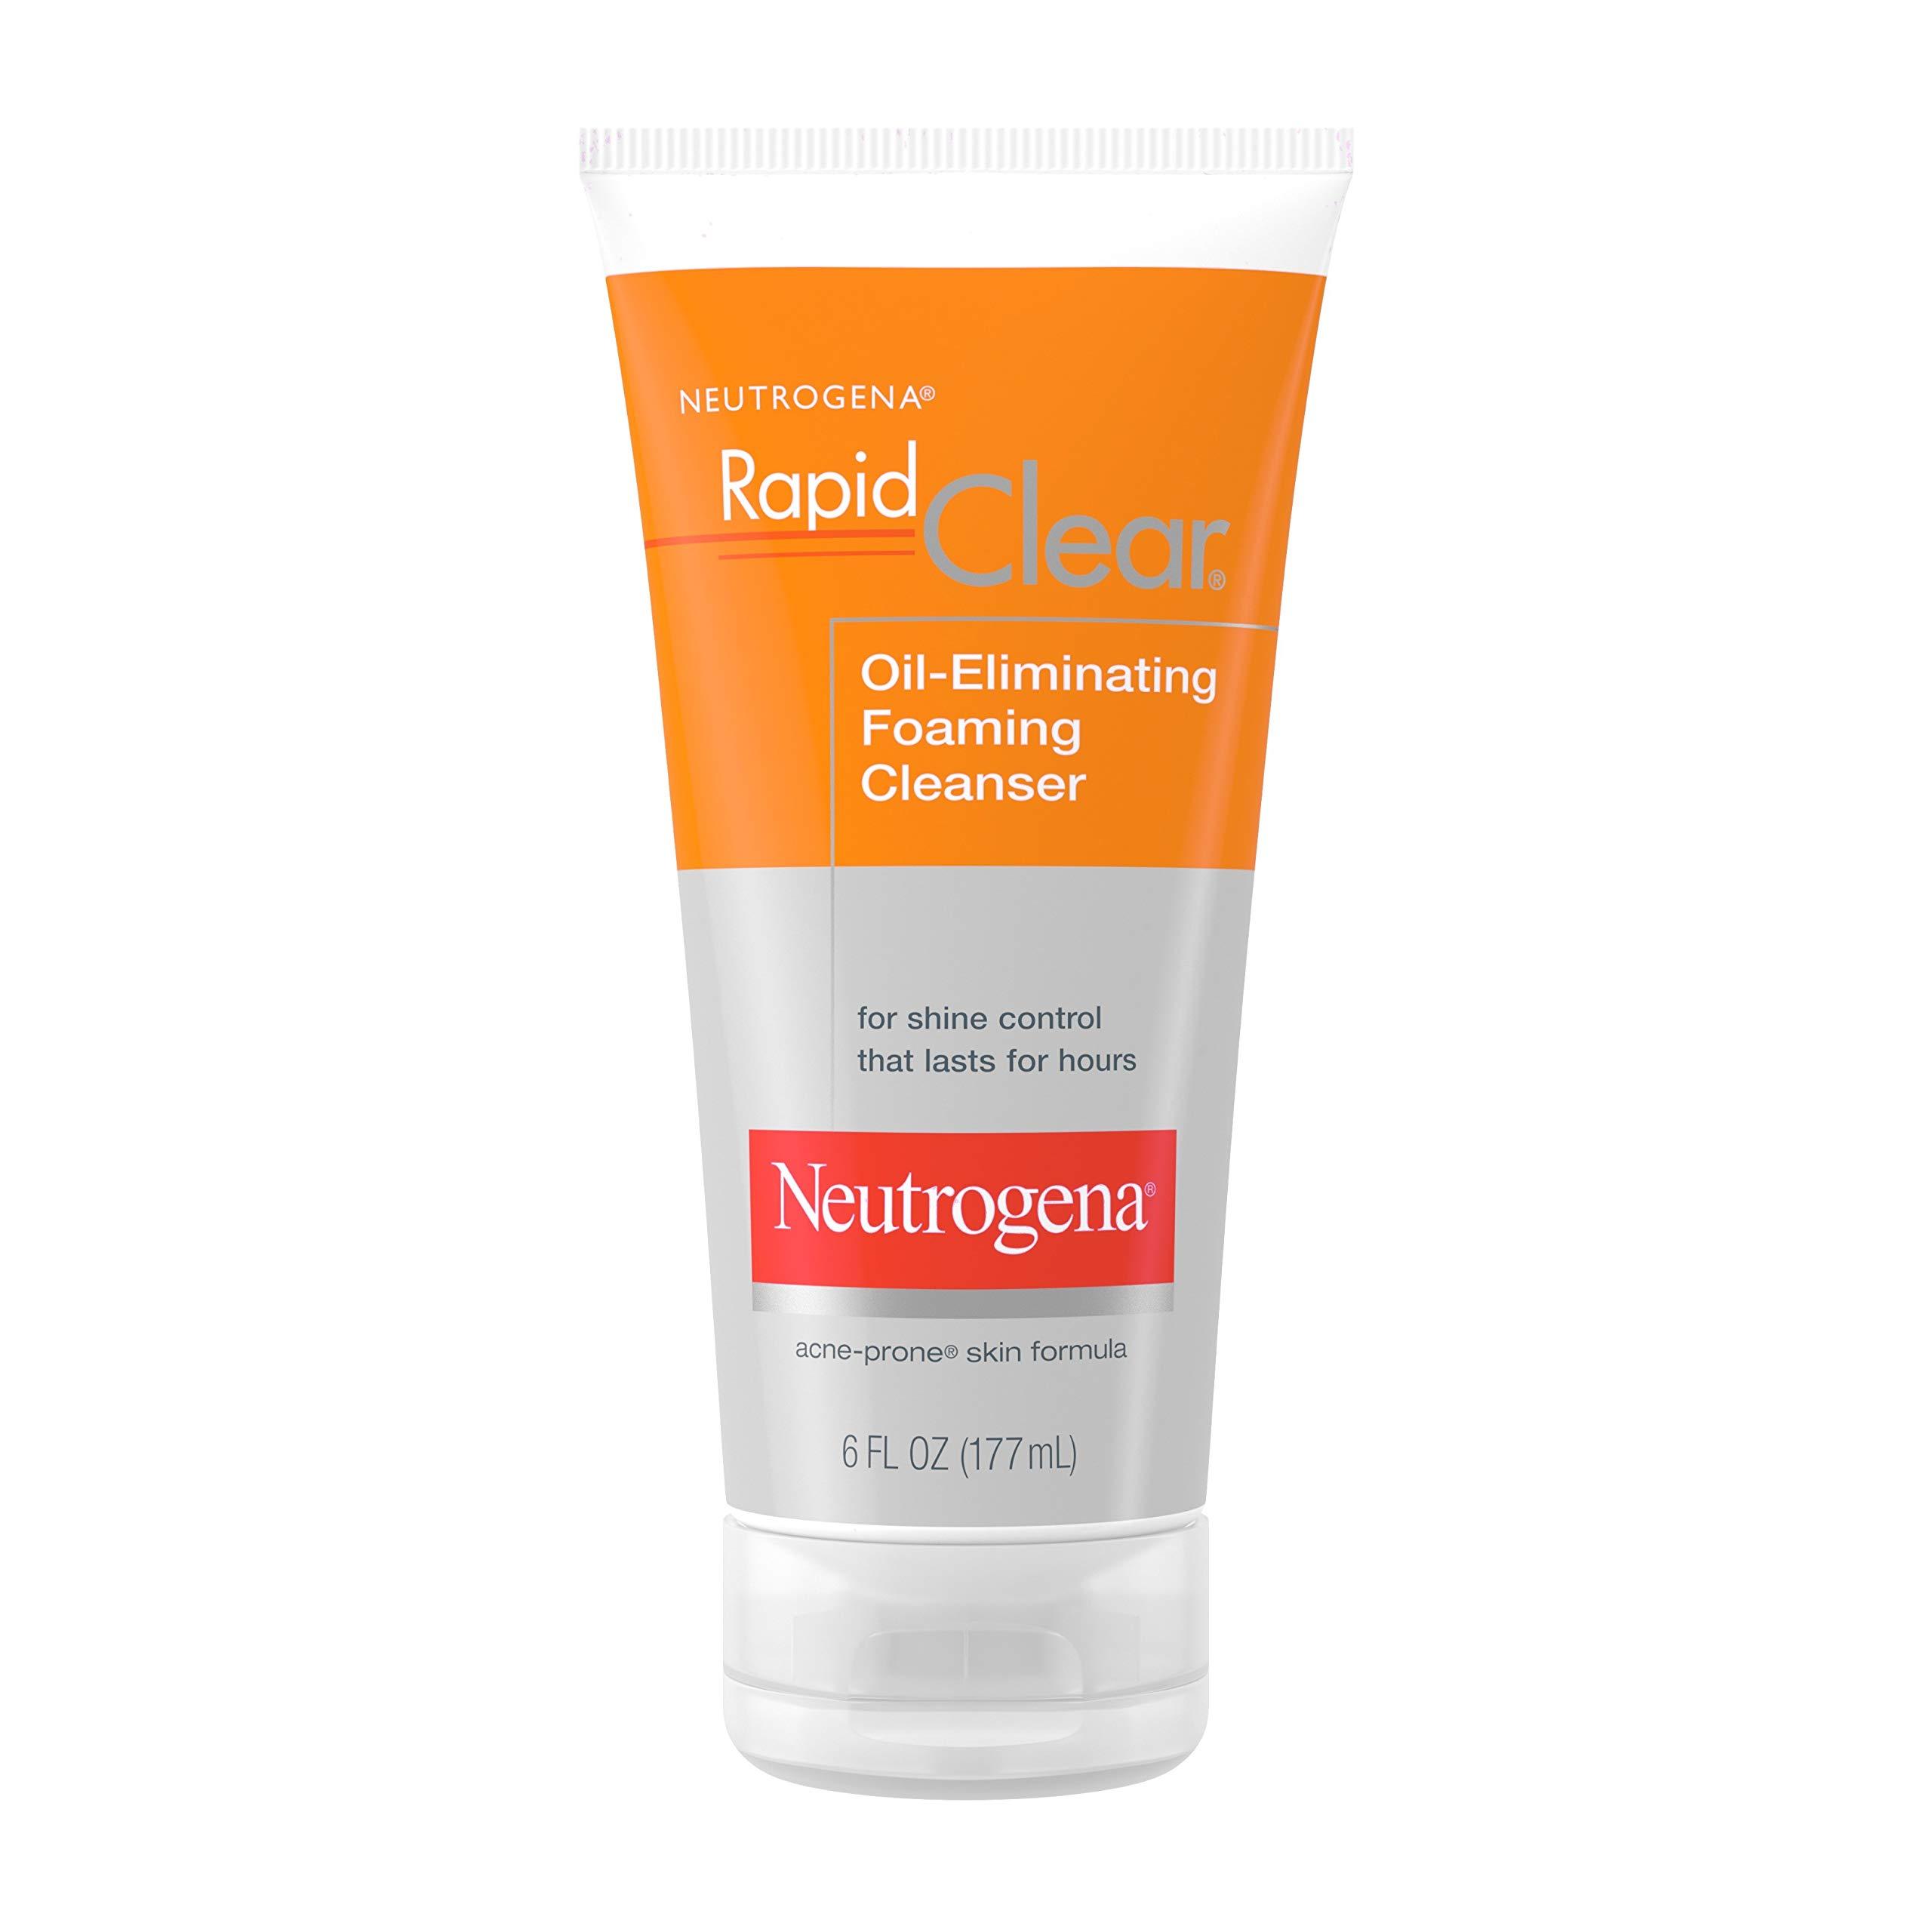 Neutrogena Rapid Clear Oil-Eliminating Foaming Facial Cleanser